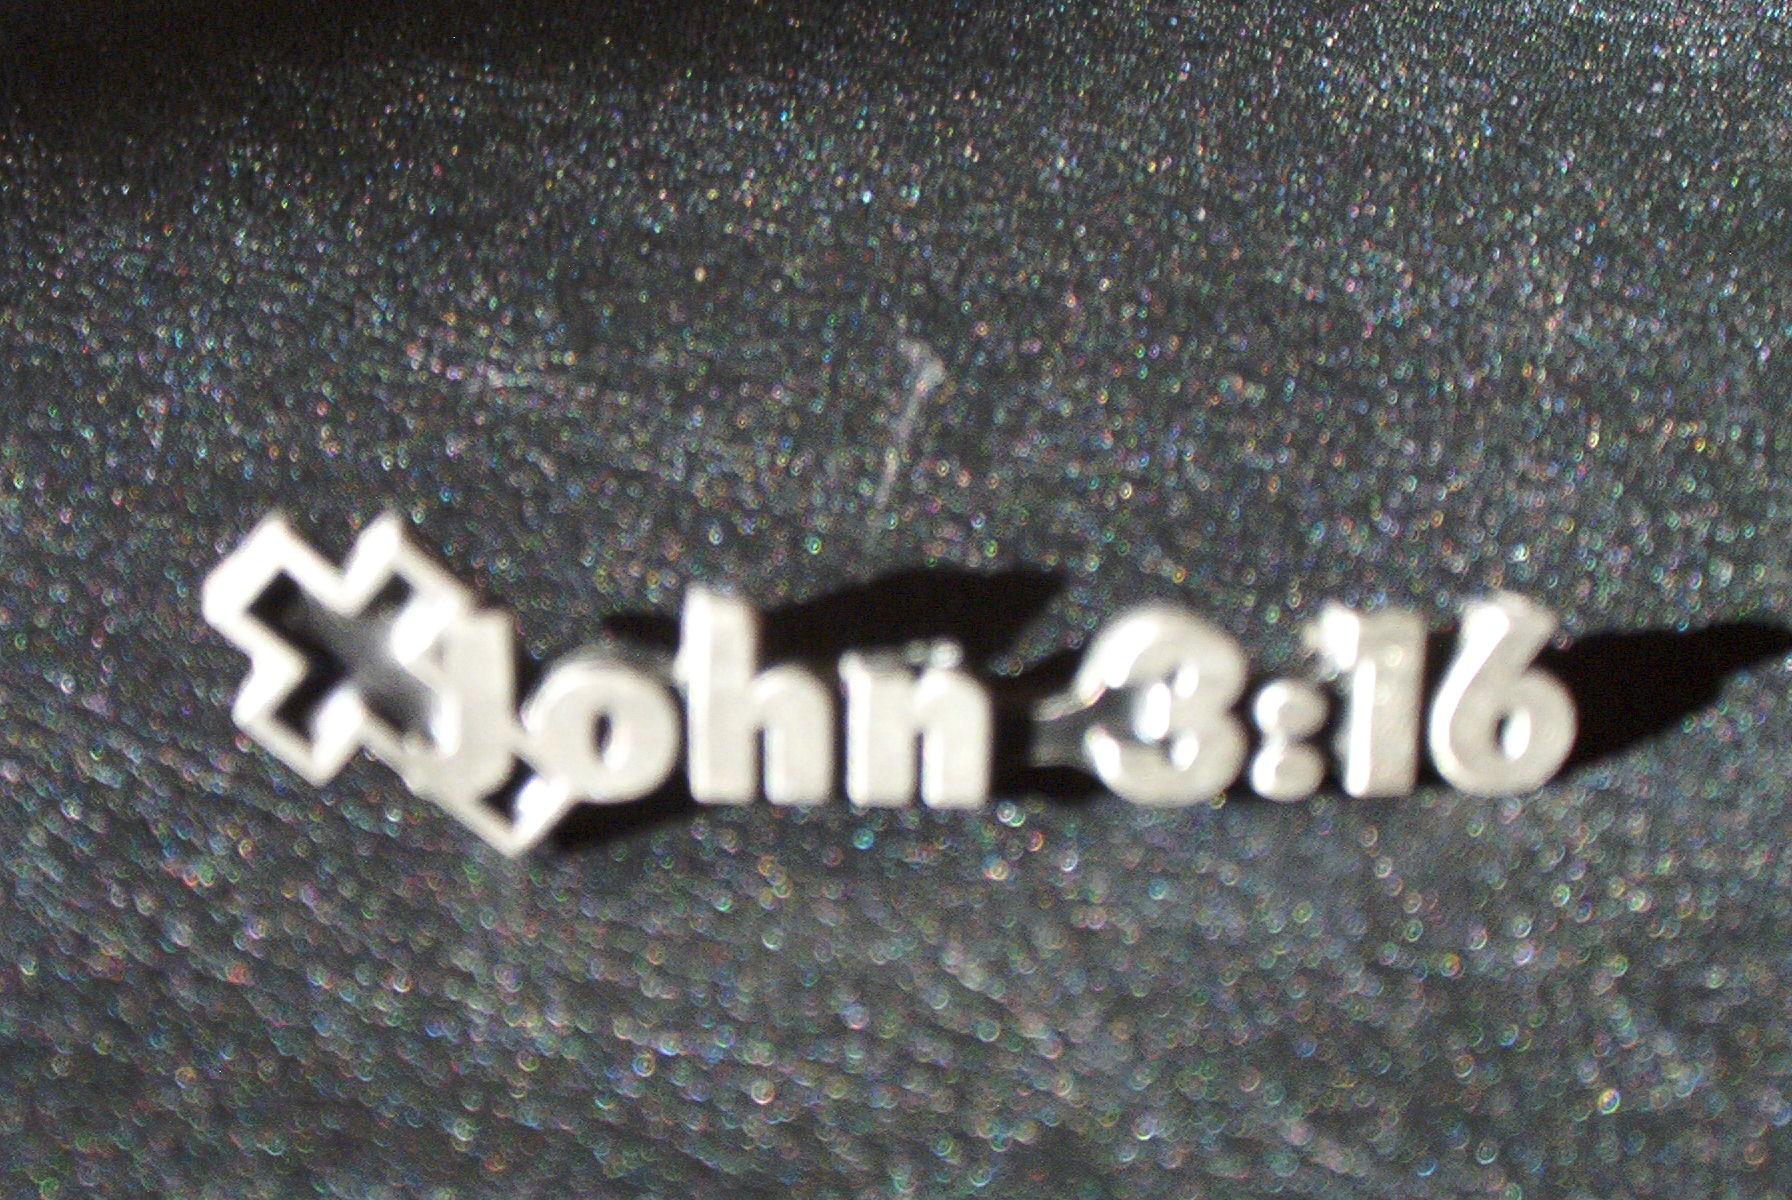 Story : John 3:16